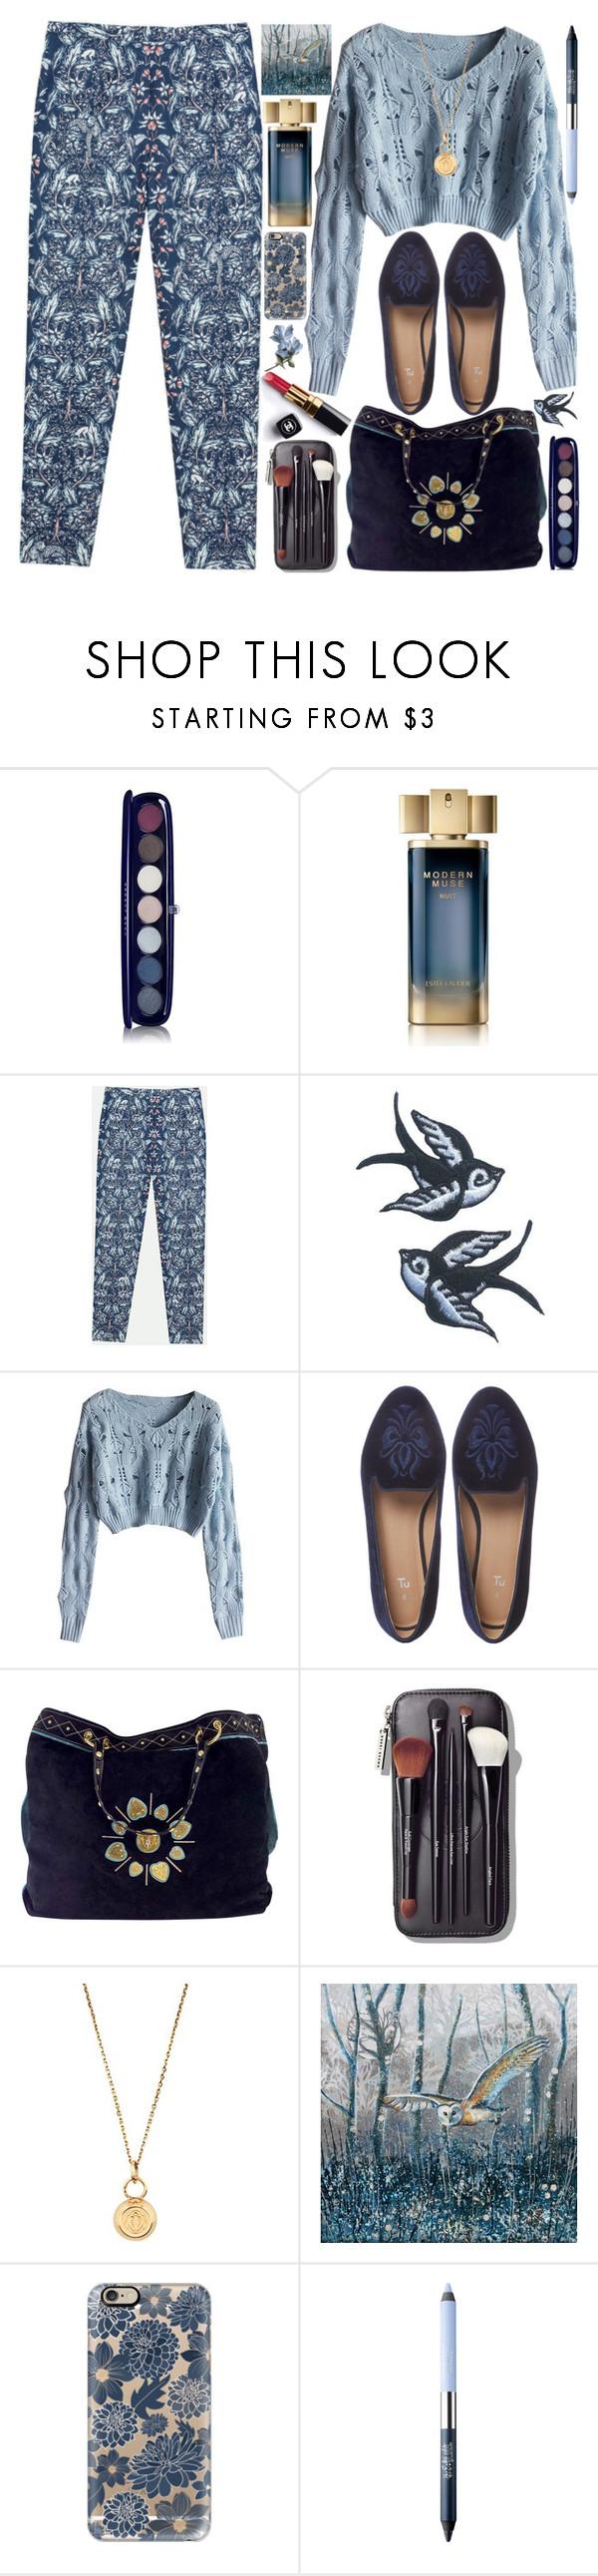 """I`m a dreamer"" by grozdana-v ❤ liked on Polyvore featuring Givenchy, Estée Lauder, Chanel, Gucci, Bobbi Brown Cosmetics, Aurélie Bidermann and Casetify"